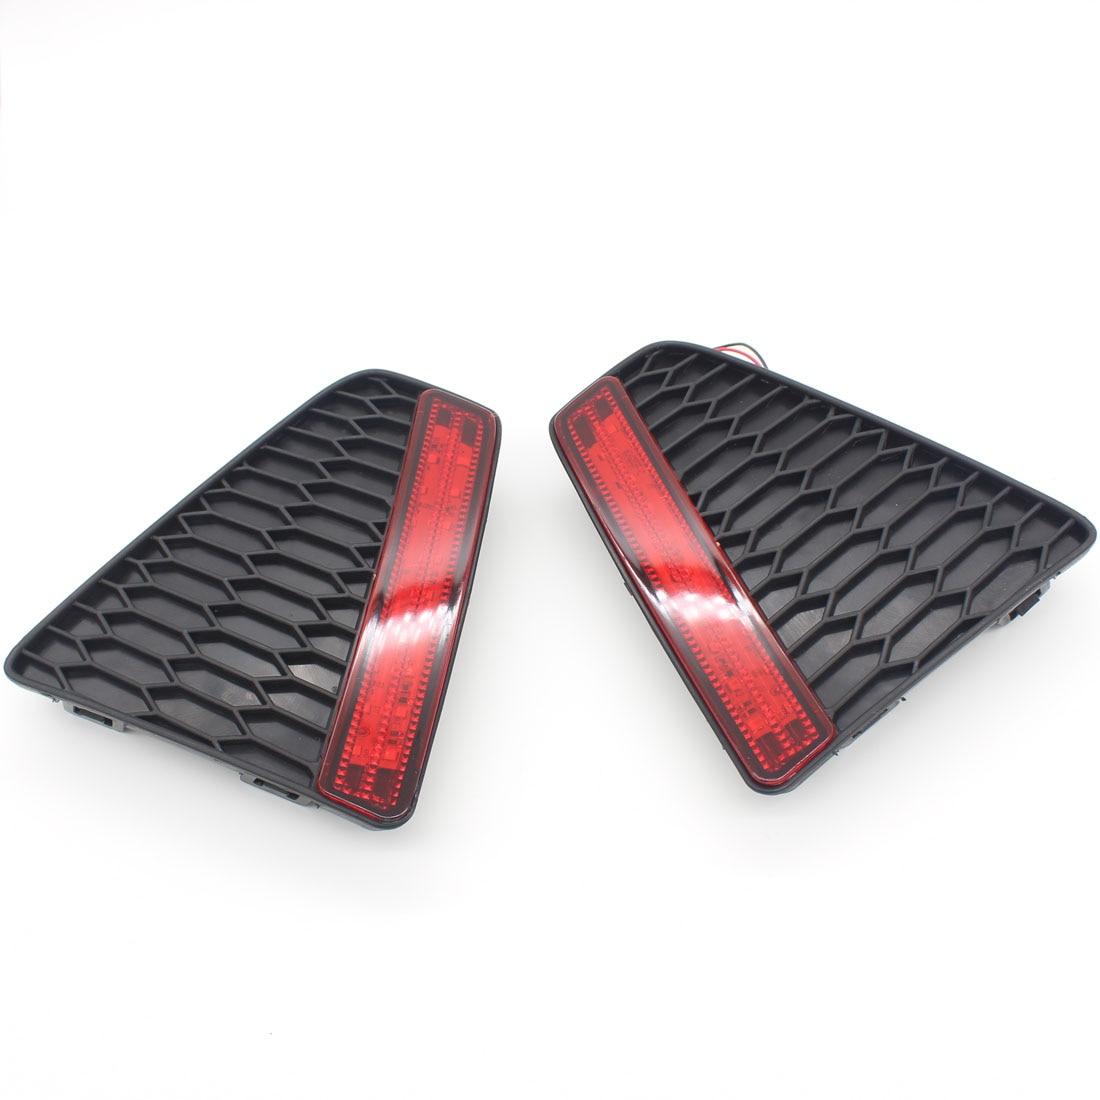 Dongzhen Backup Tail Rear Bumper Lamp LED Reflector stop Brake light fog lamp Fit For Honda Fit 2014-2015 car styling